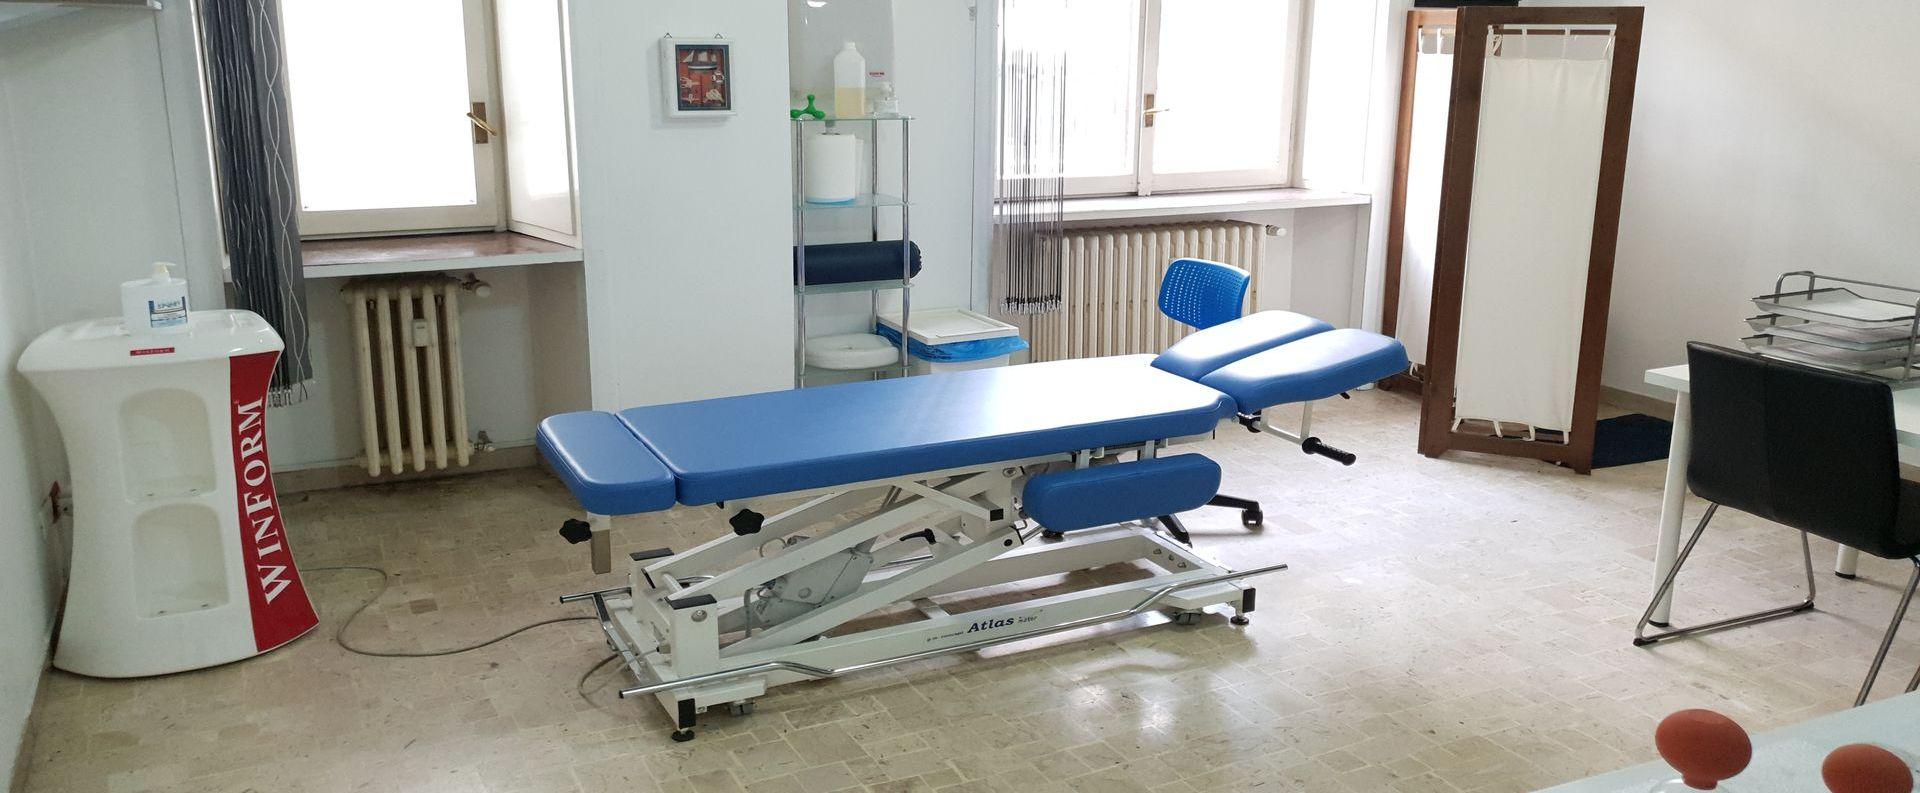 Studio fisioterapia e osteopatia Milano